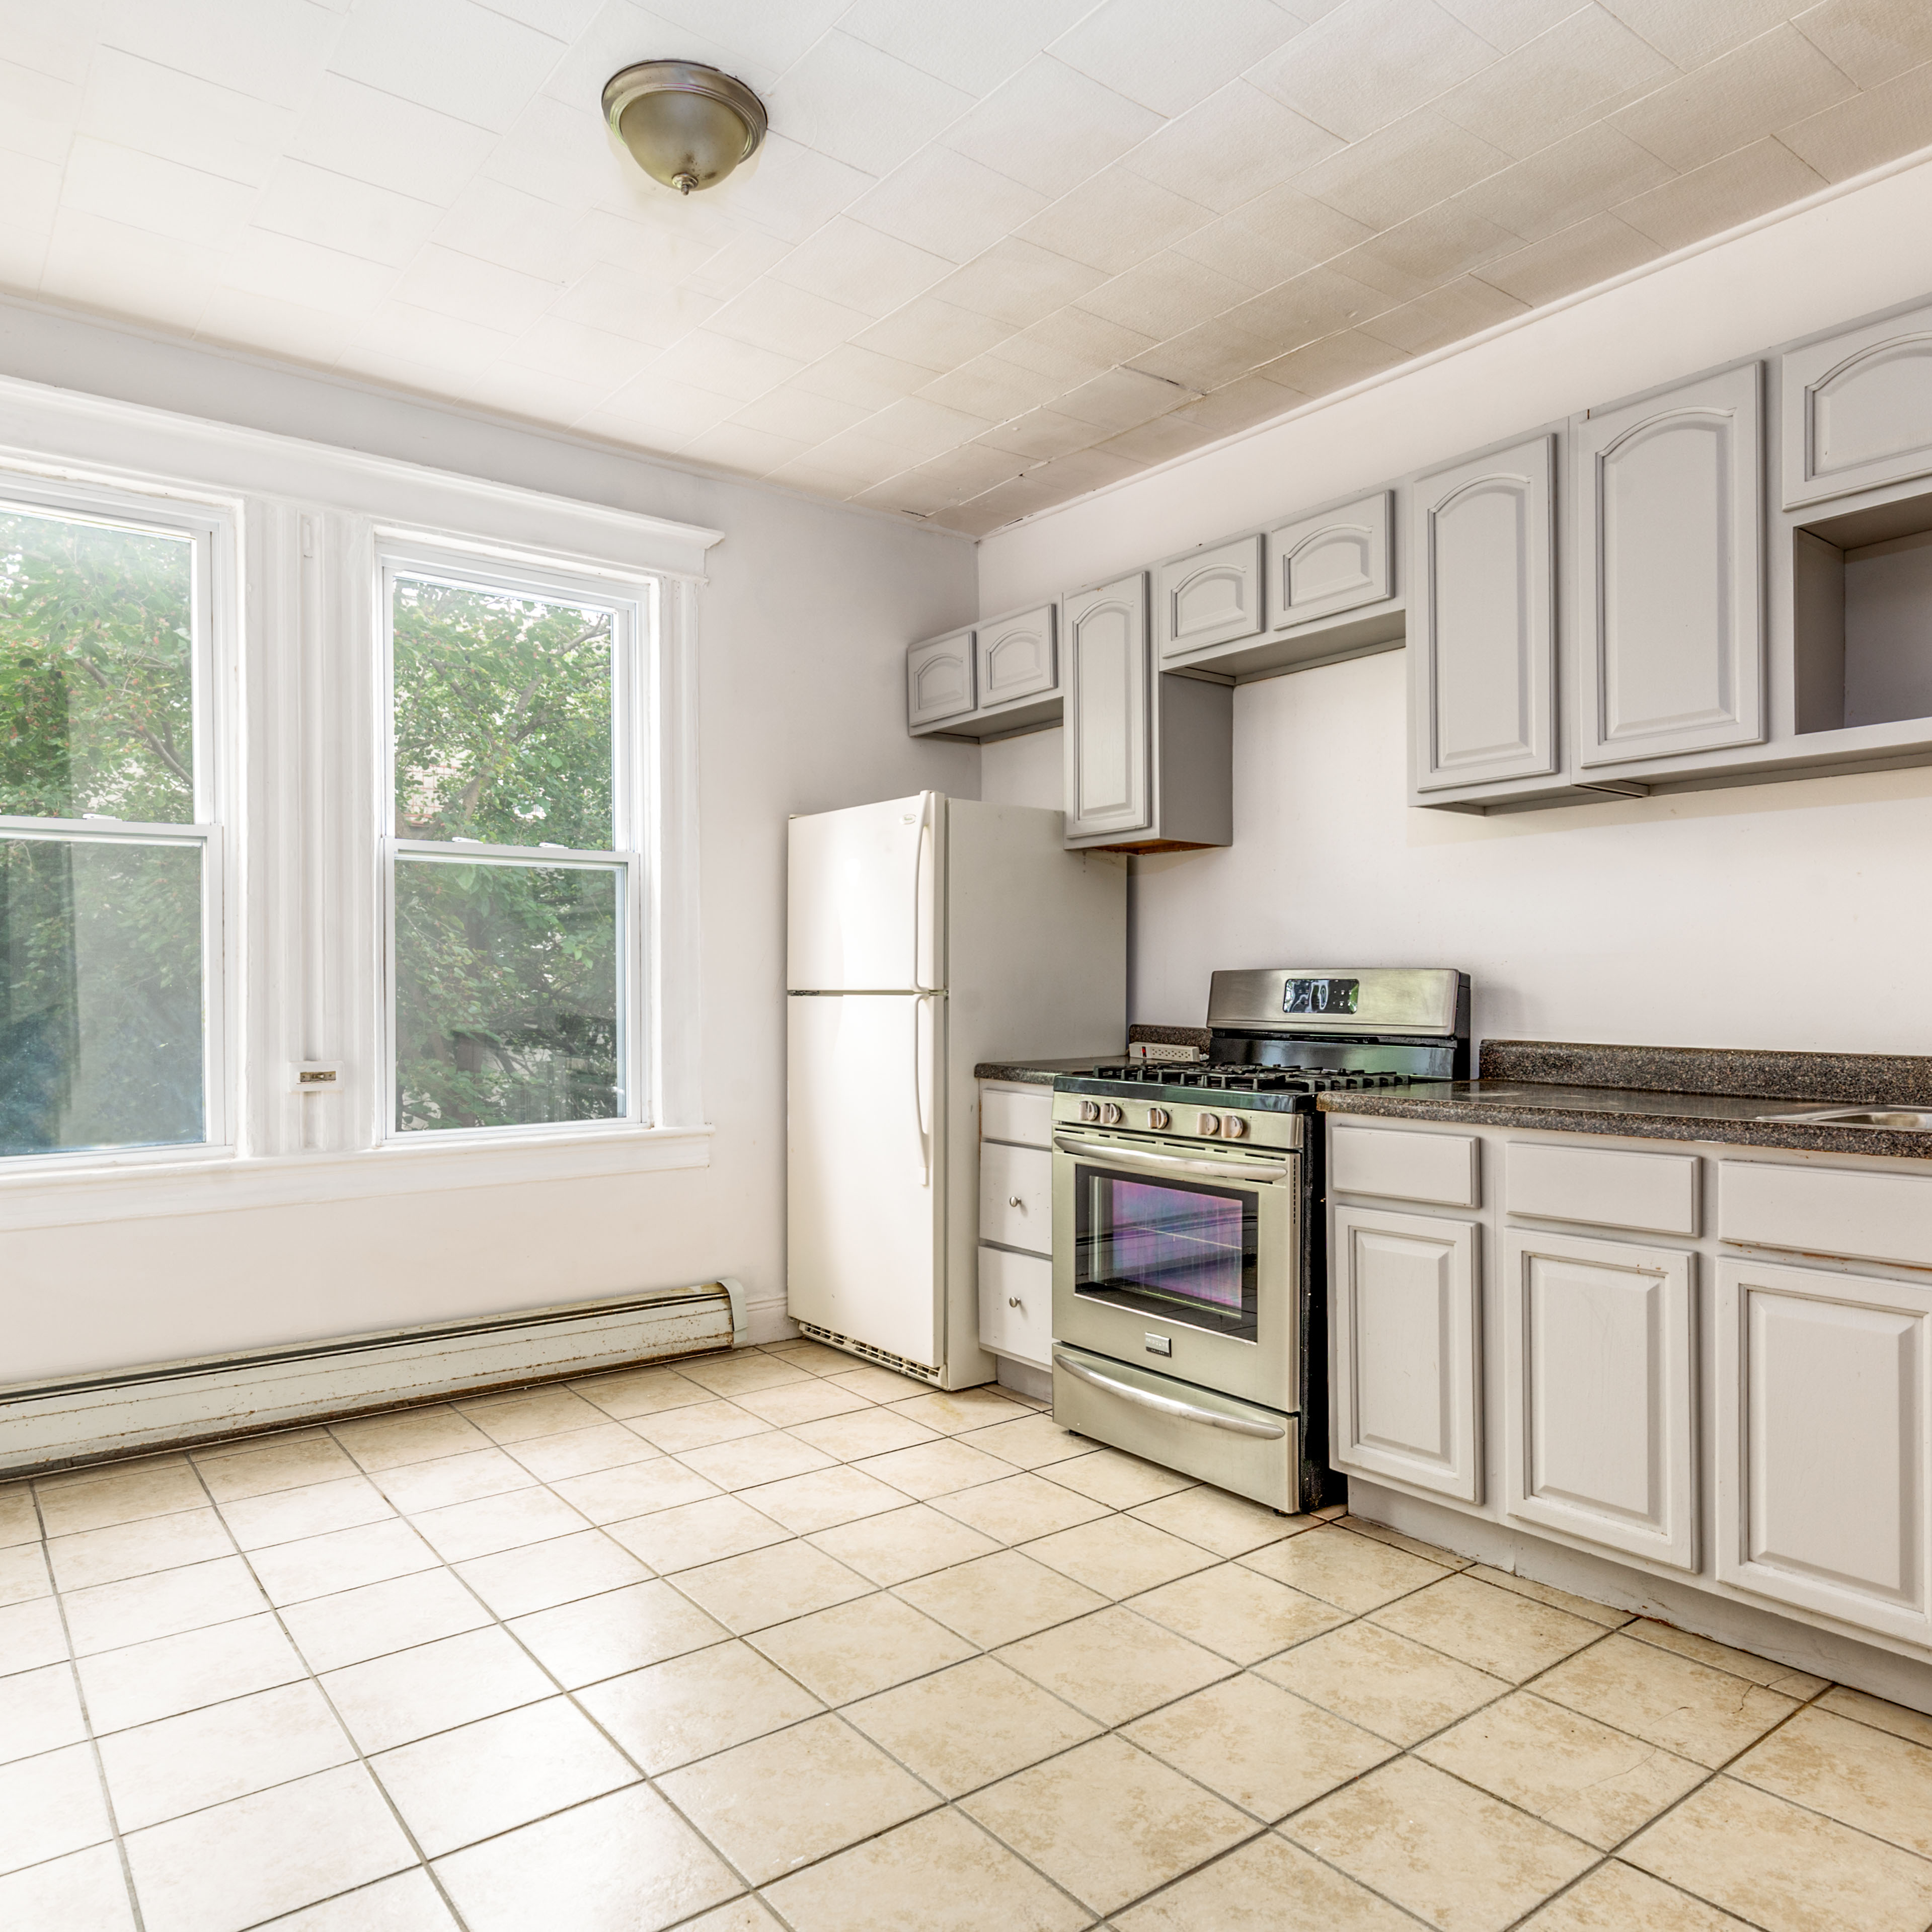 Image of property 153 Myrtle Ave, U2